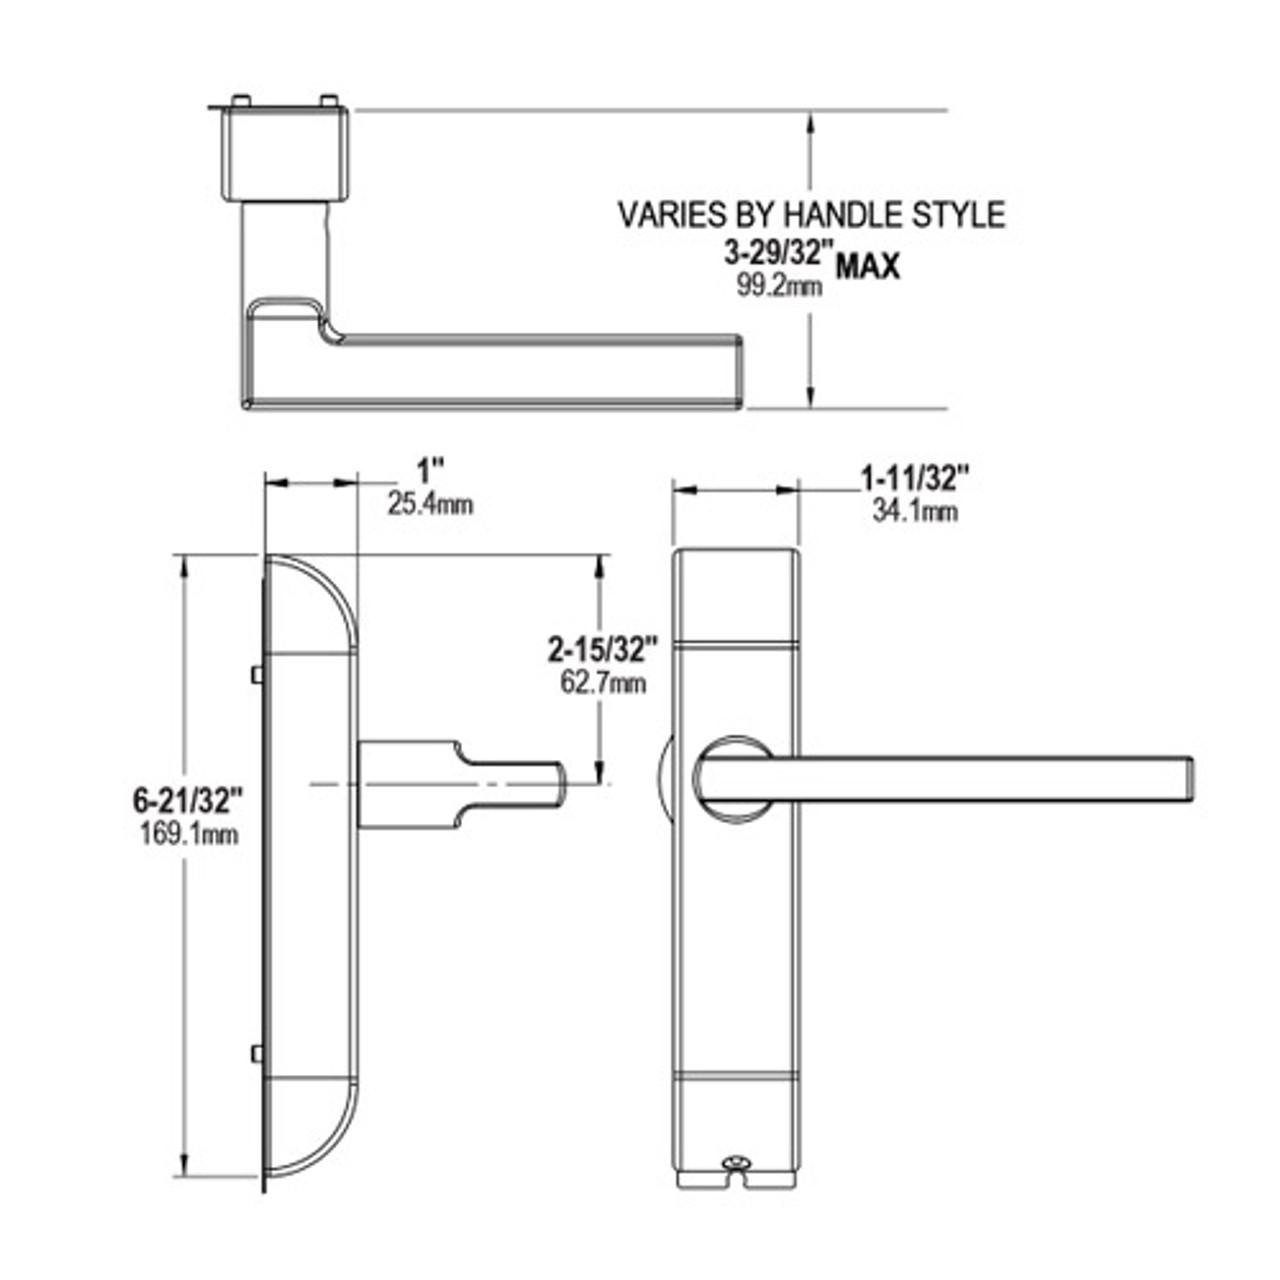 4600M-MV-531-US3 Adams Rite MV Designer handle Dimensional View